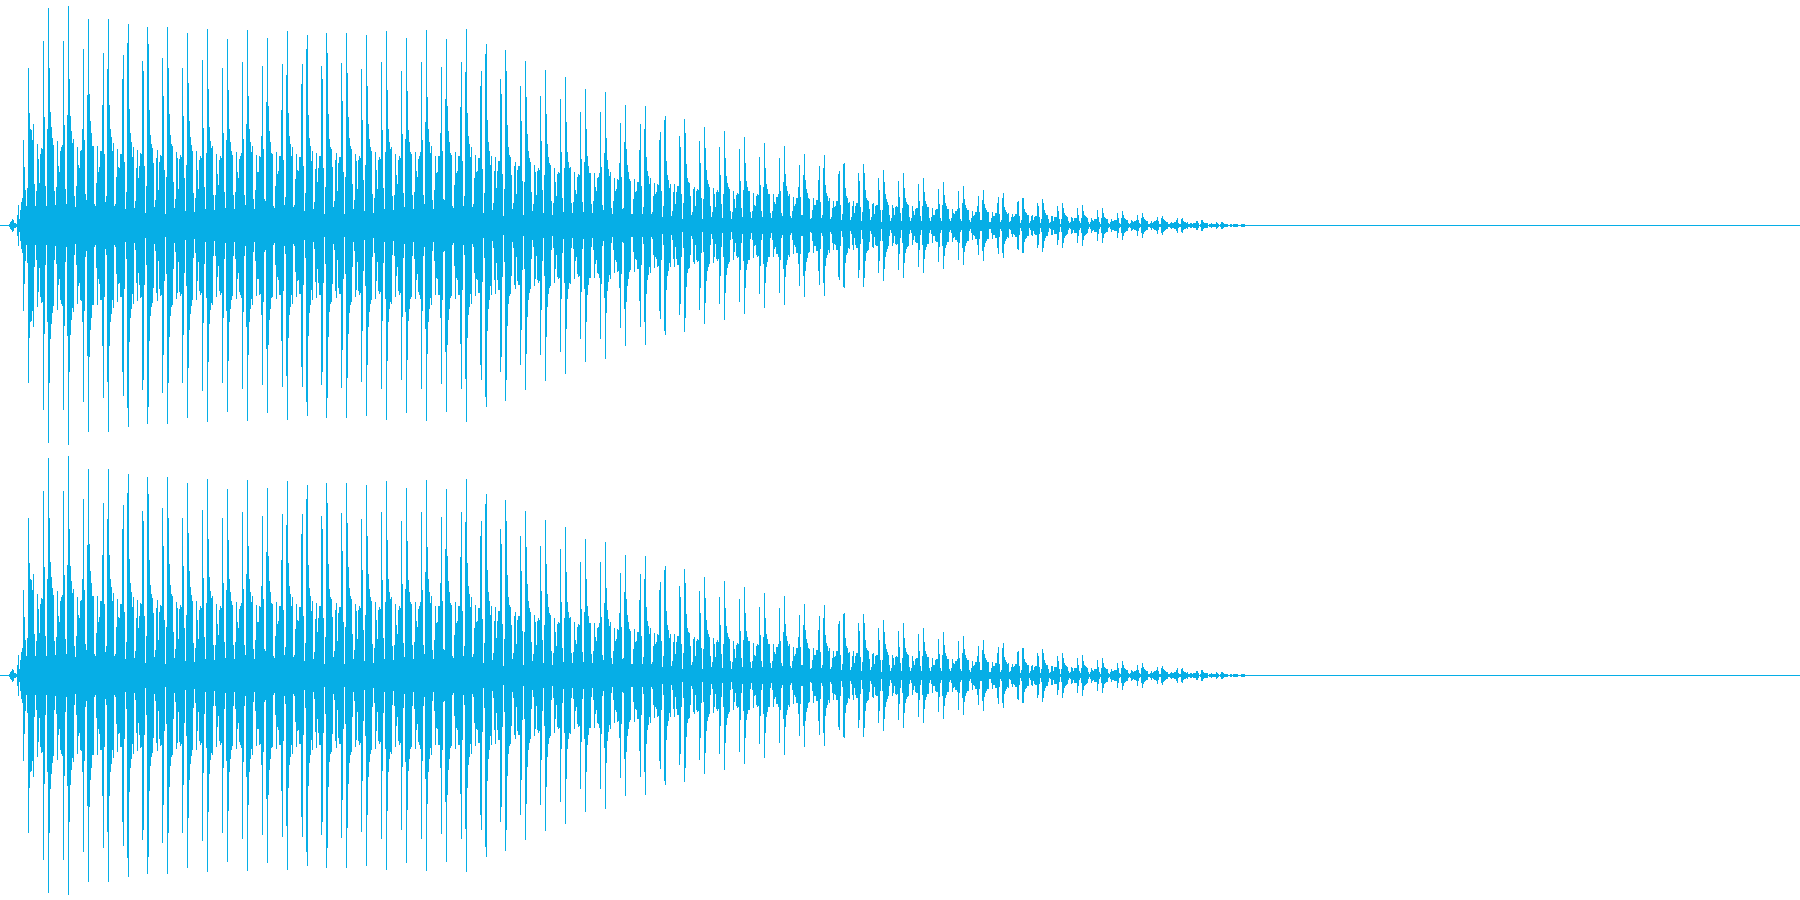 OctaveCom アプリ用タッチ音2の再生済みの波形